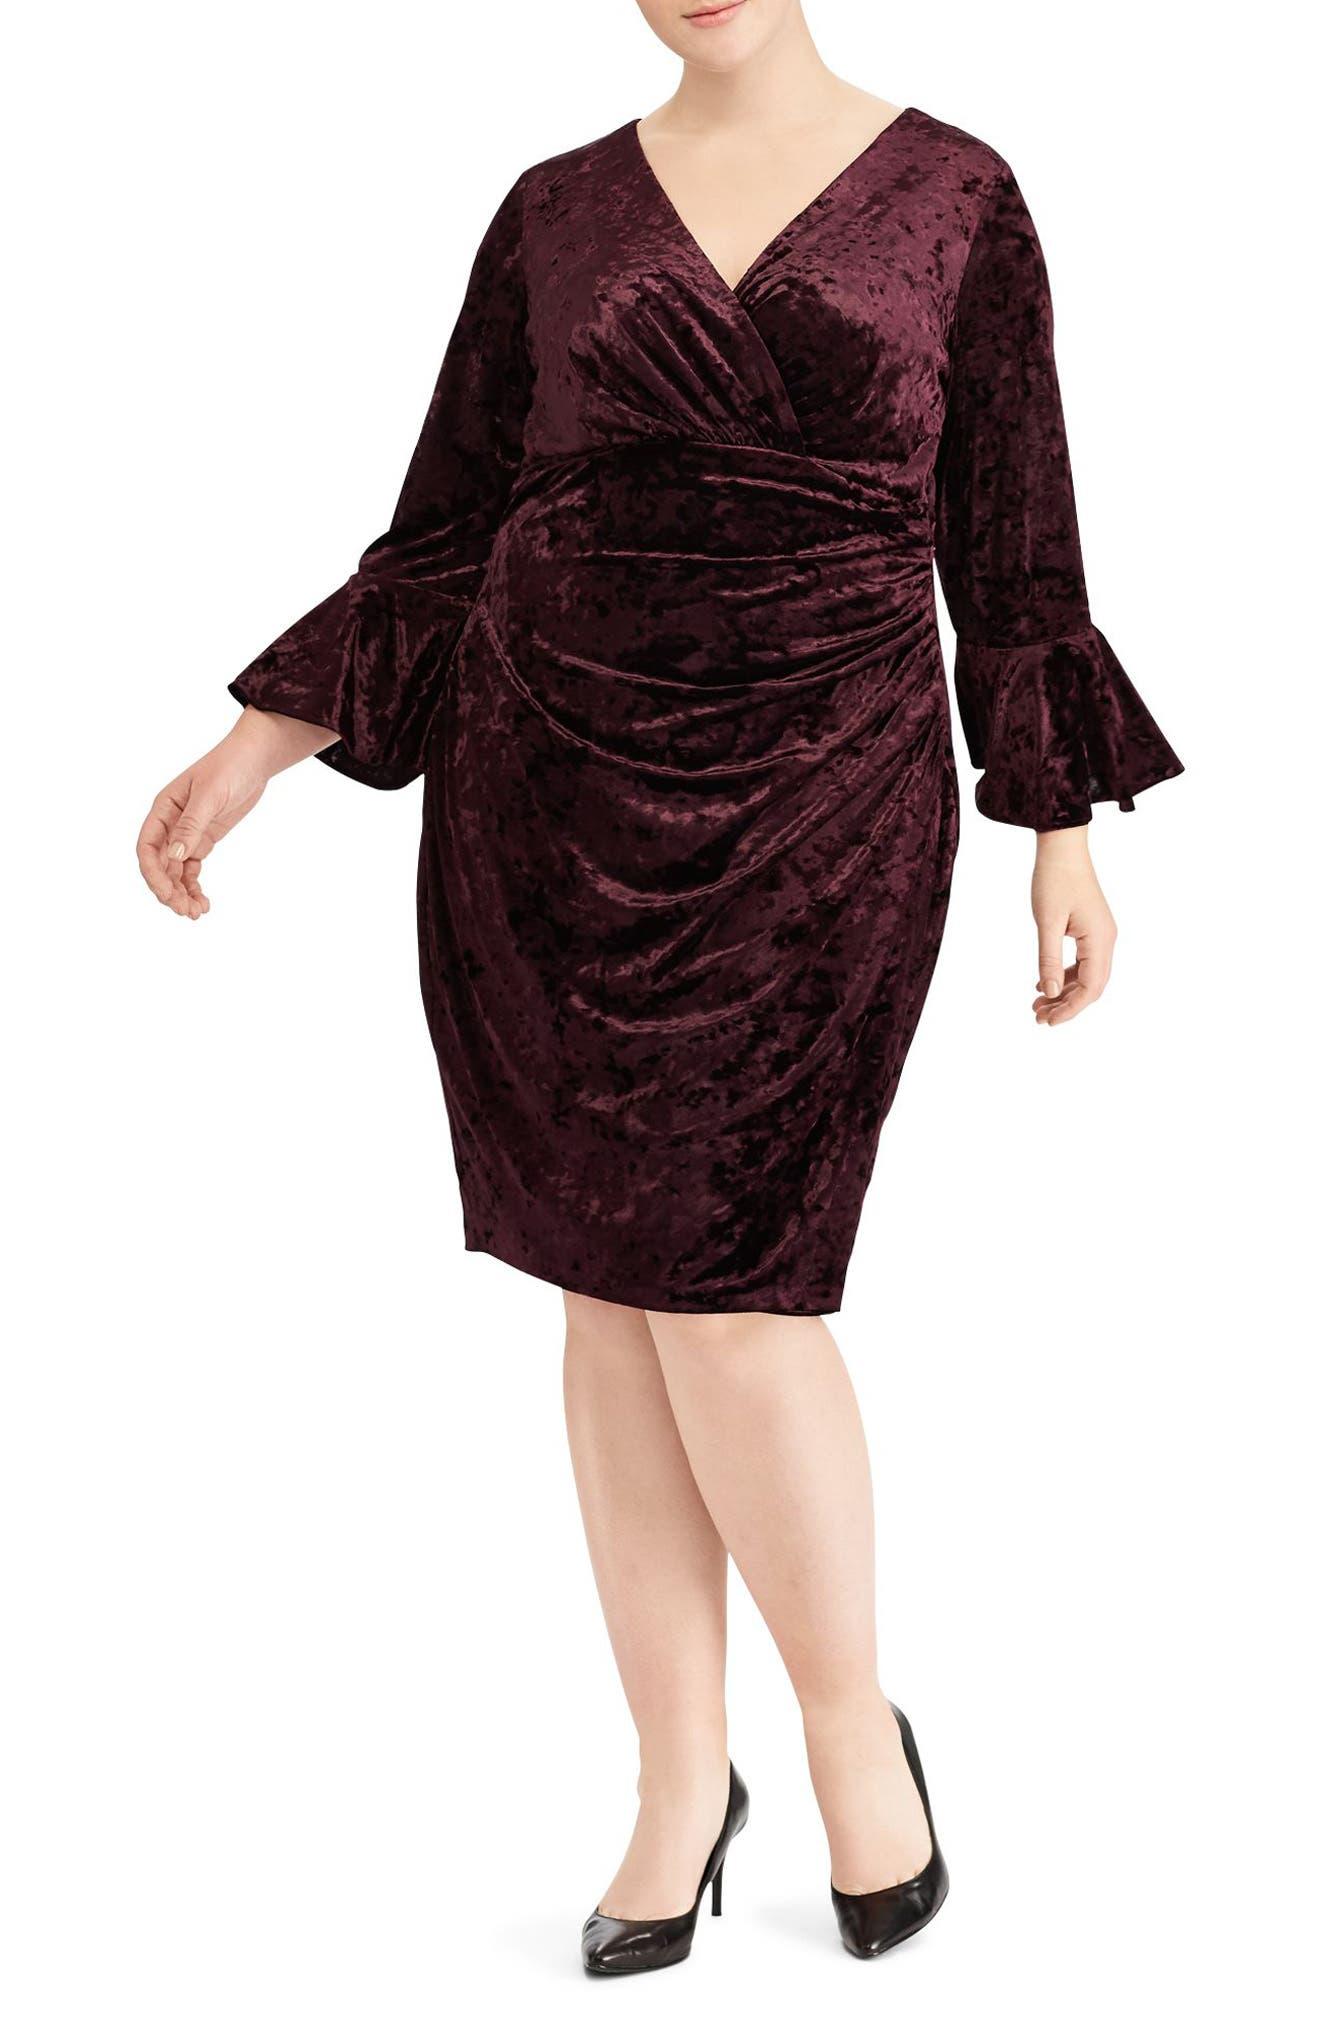 Ruched Crushed Velvet Sheath Dress,                             Main thumbnail 1, color,                             Maroon